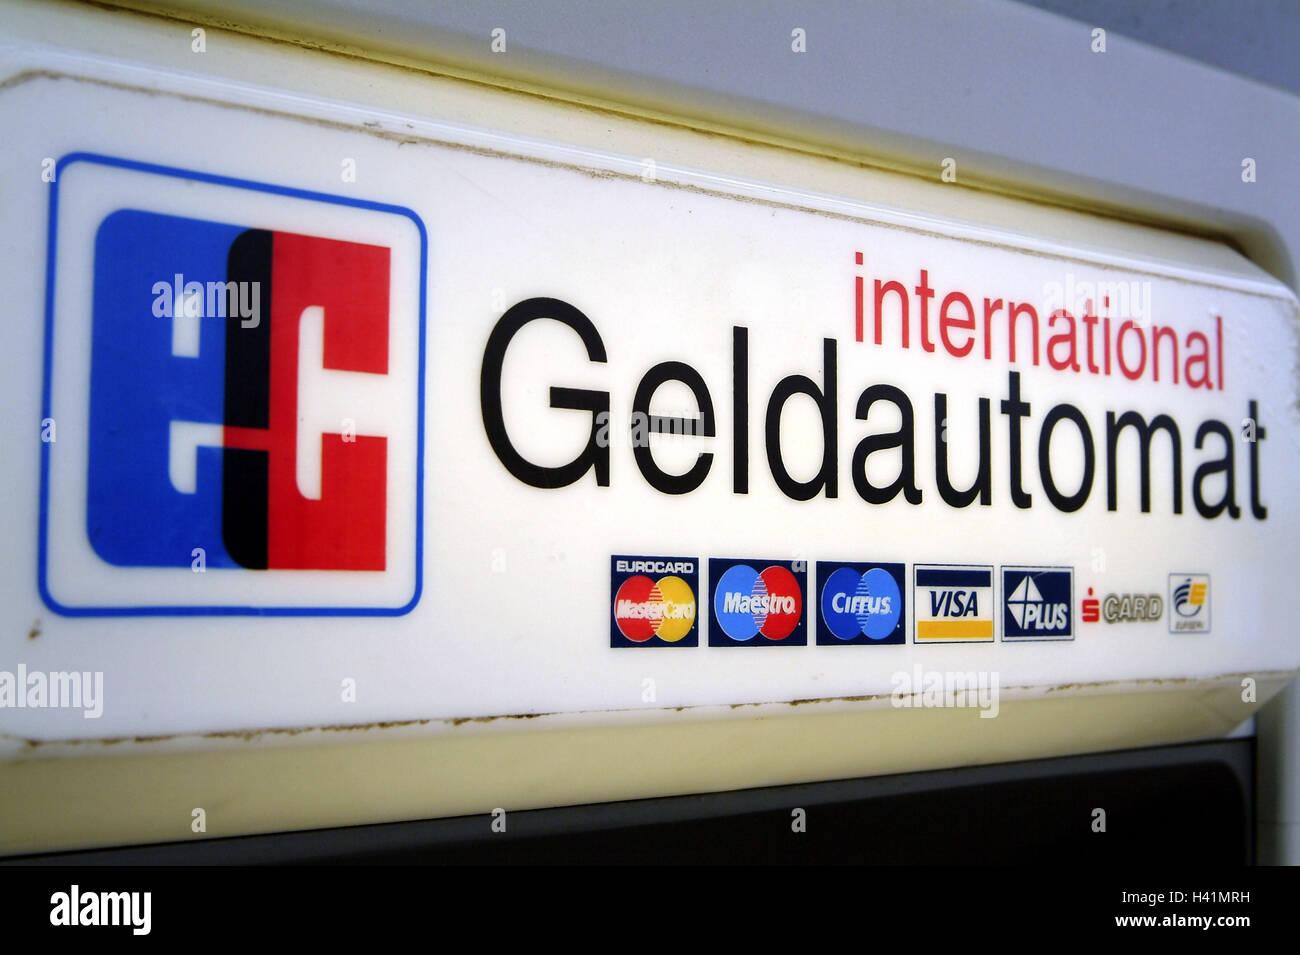 Sign, automatic teller, international   Hint, EC, bank, money, finances, EC-Automat, bank vending machine, vending - Stock Image